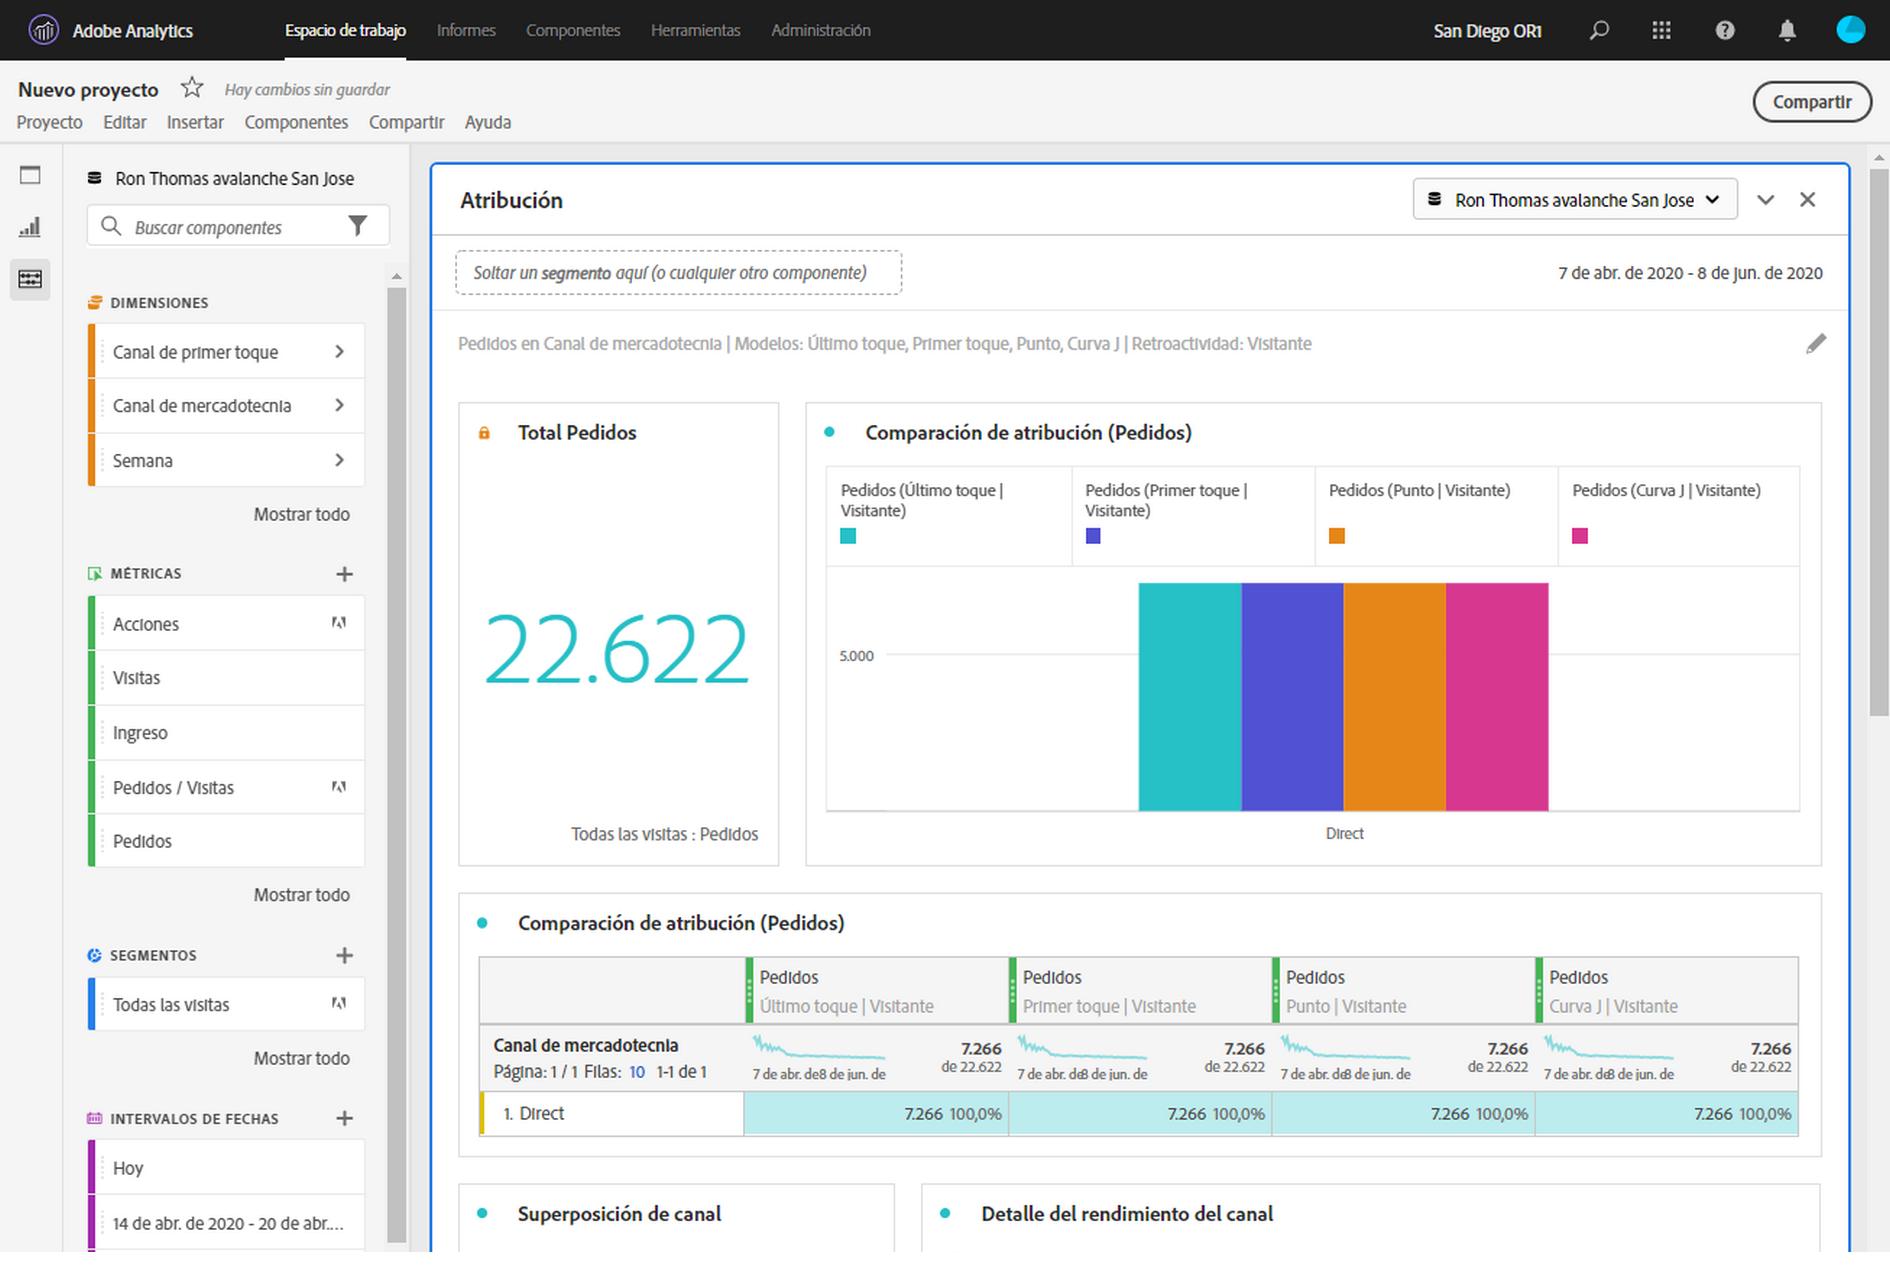 Adobe Analytics marketing attribution dashboard